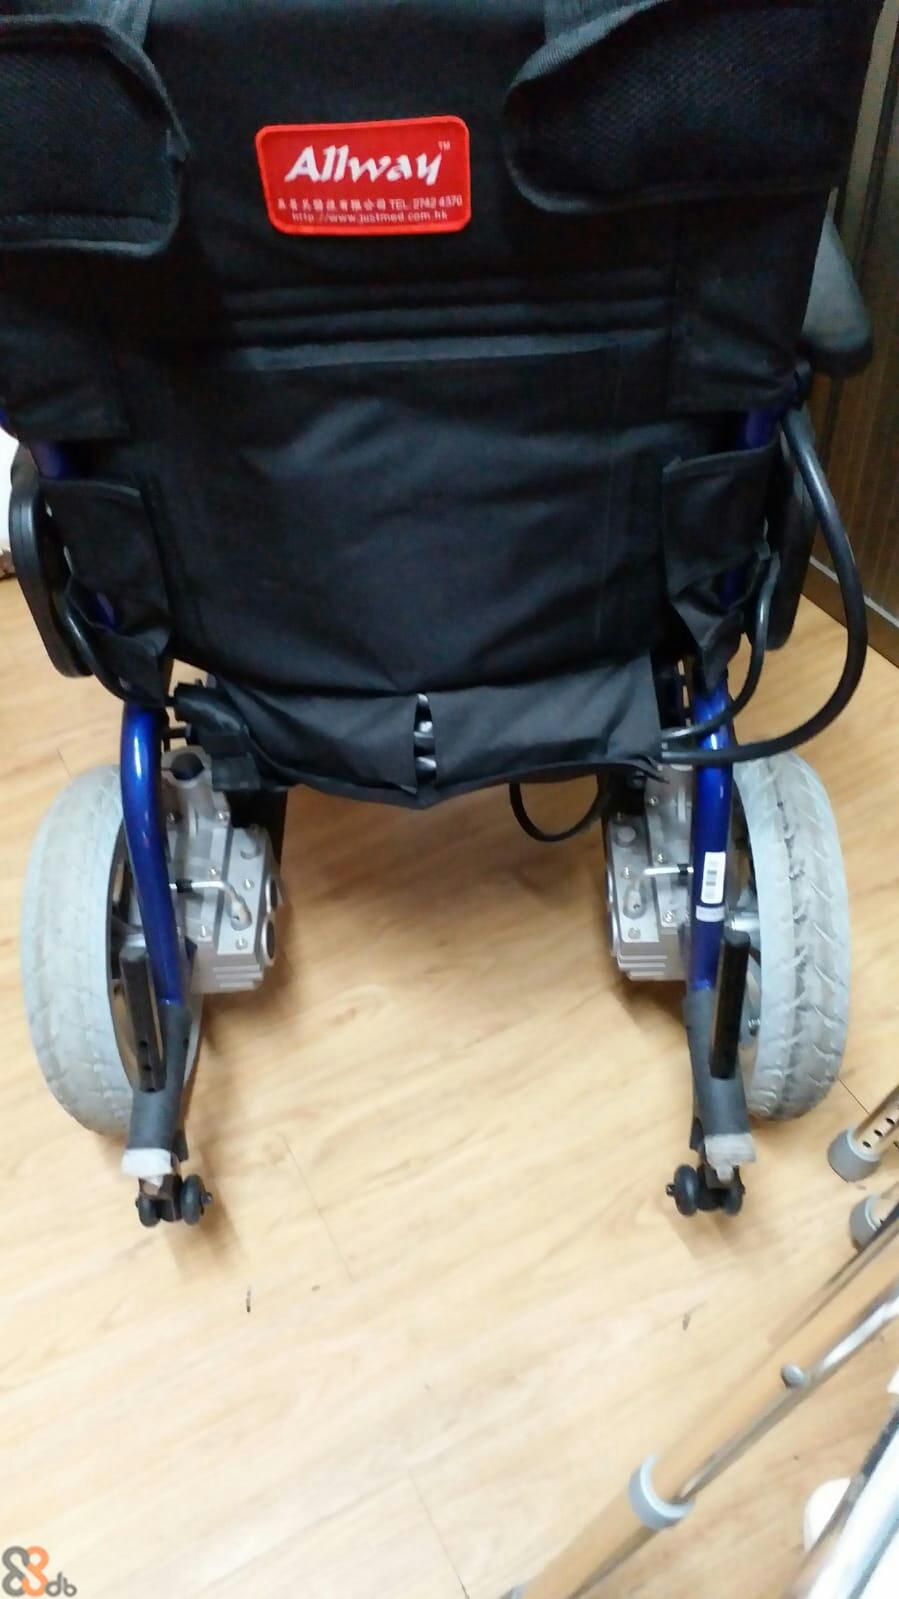 Allway  Wheelchair,Product,Motorized wheelchair,Leg,Electric blue